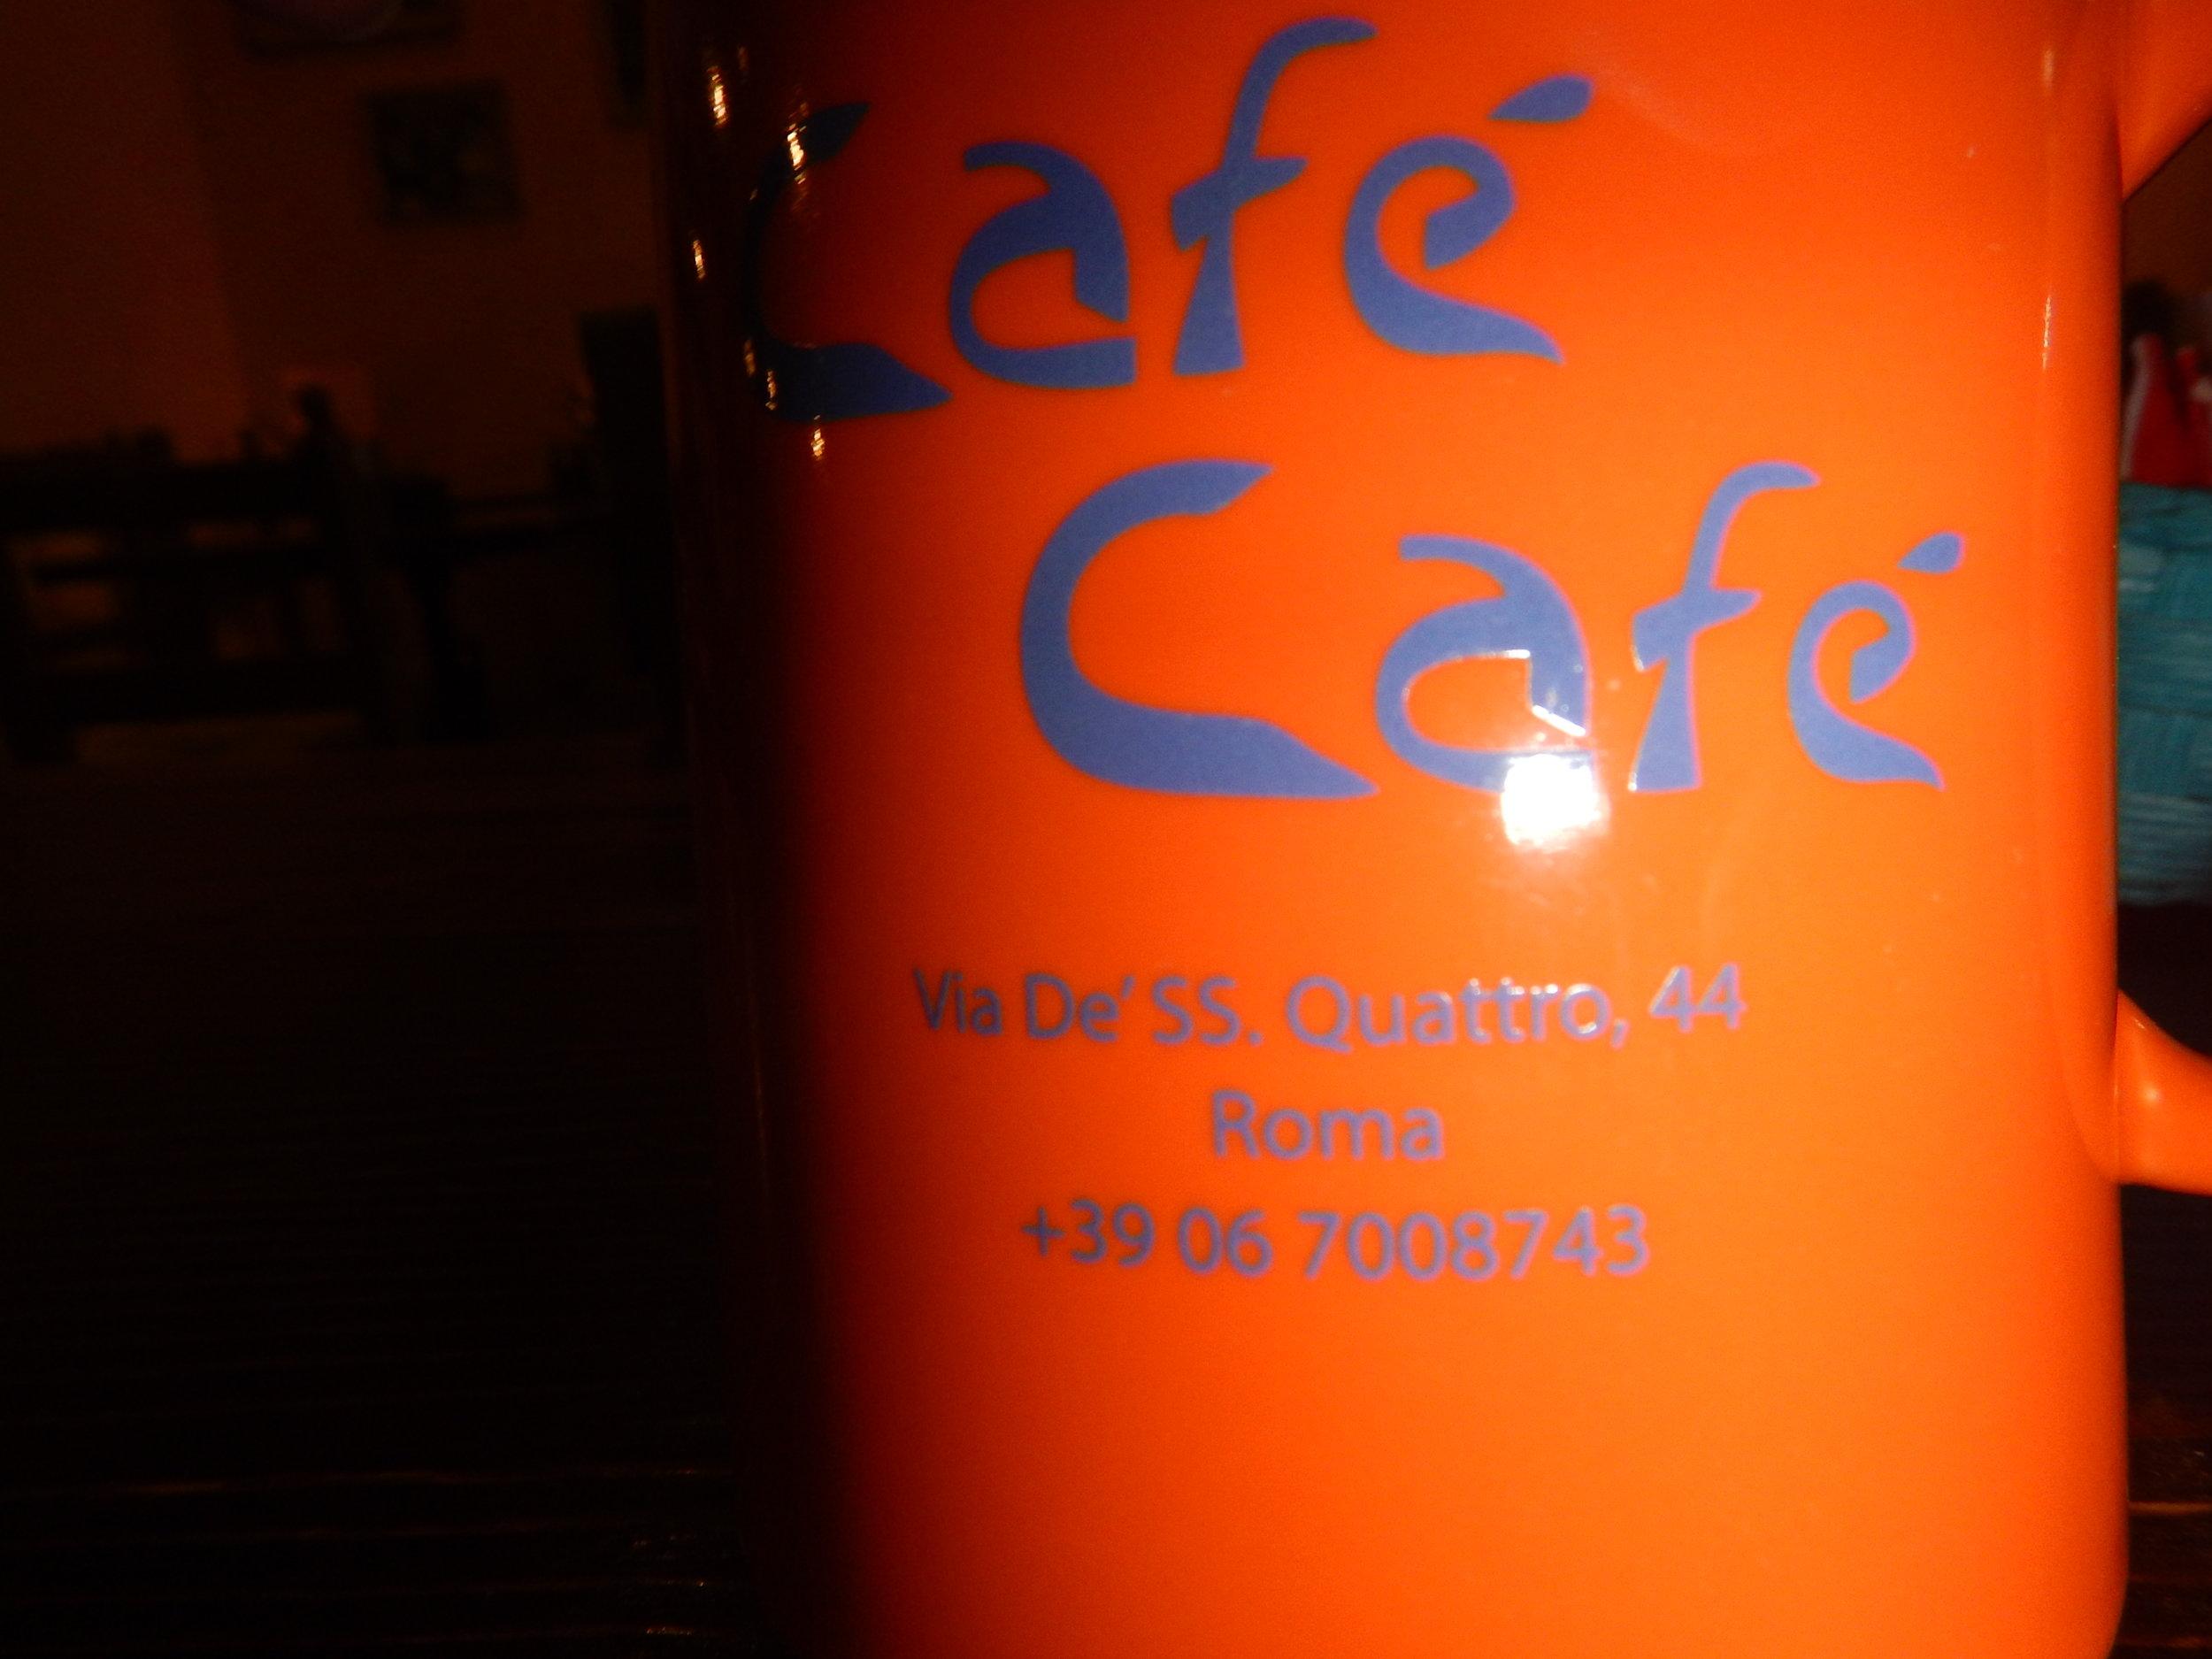 name and address on each mug. Great idea.